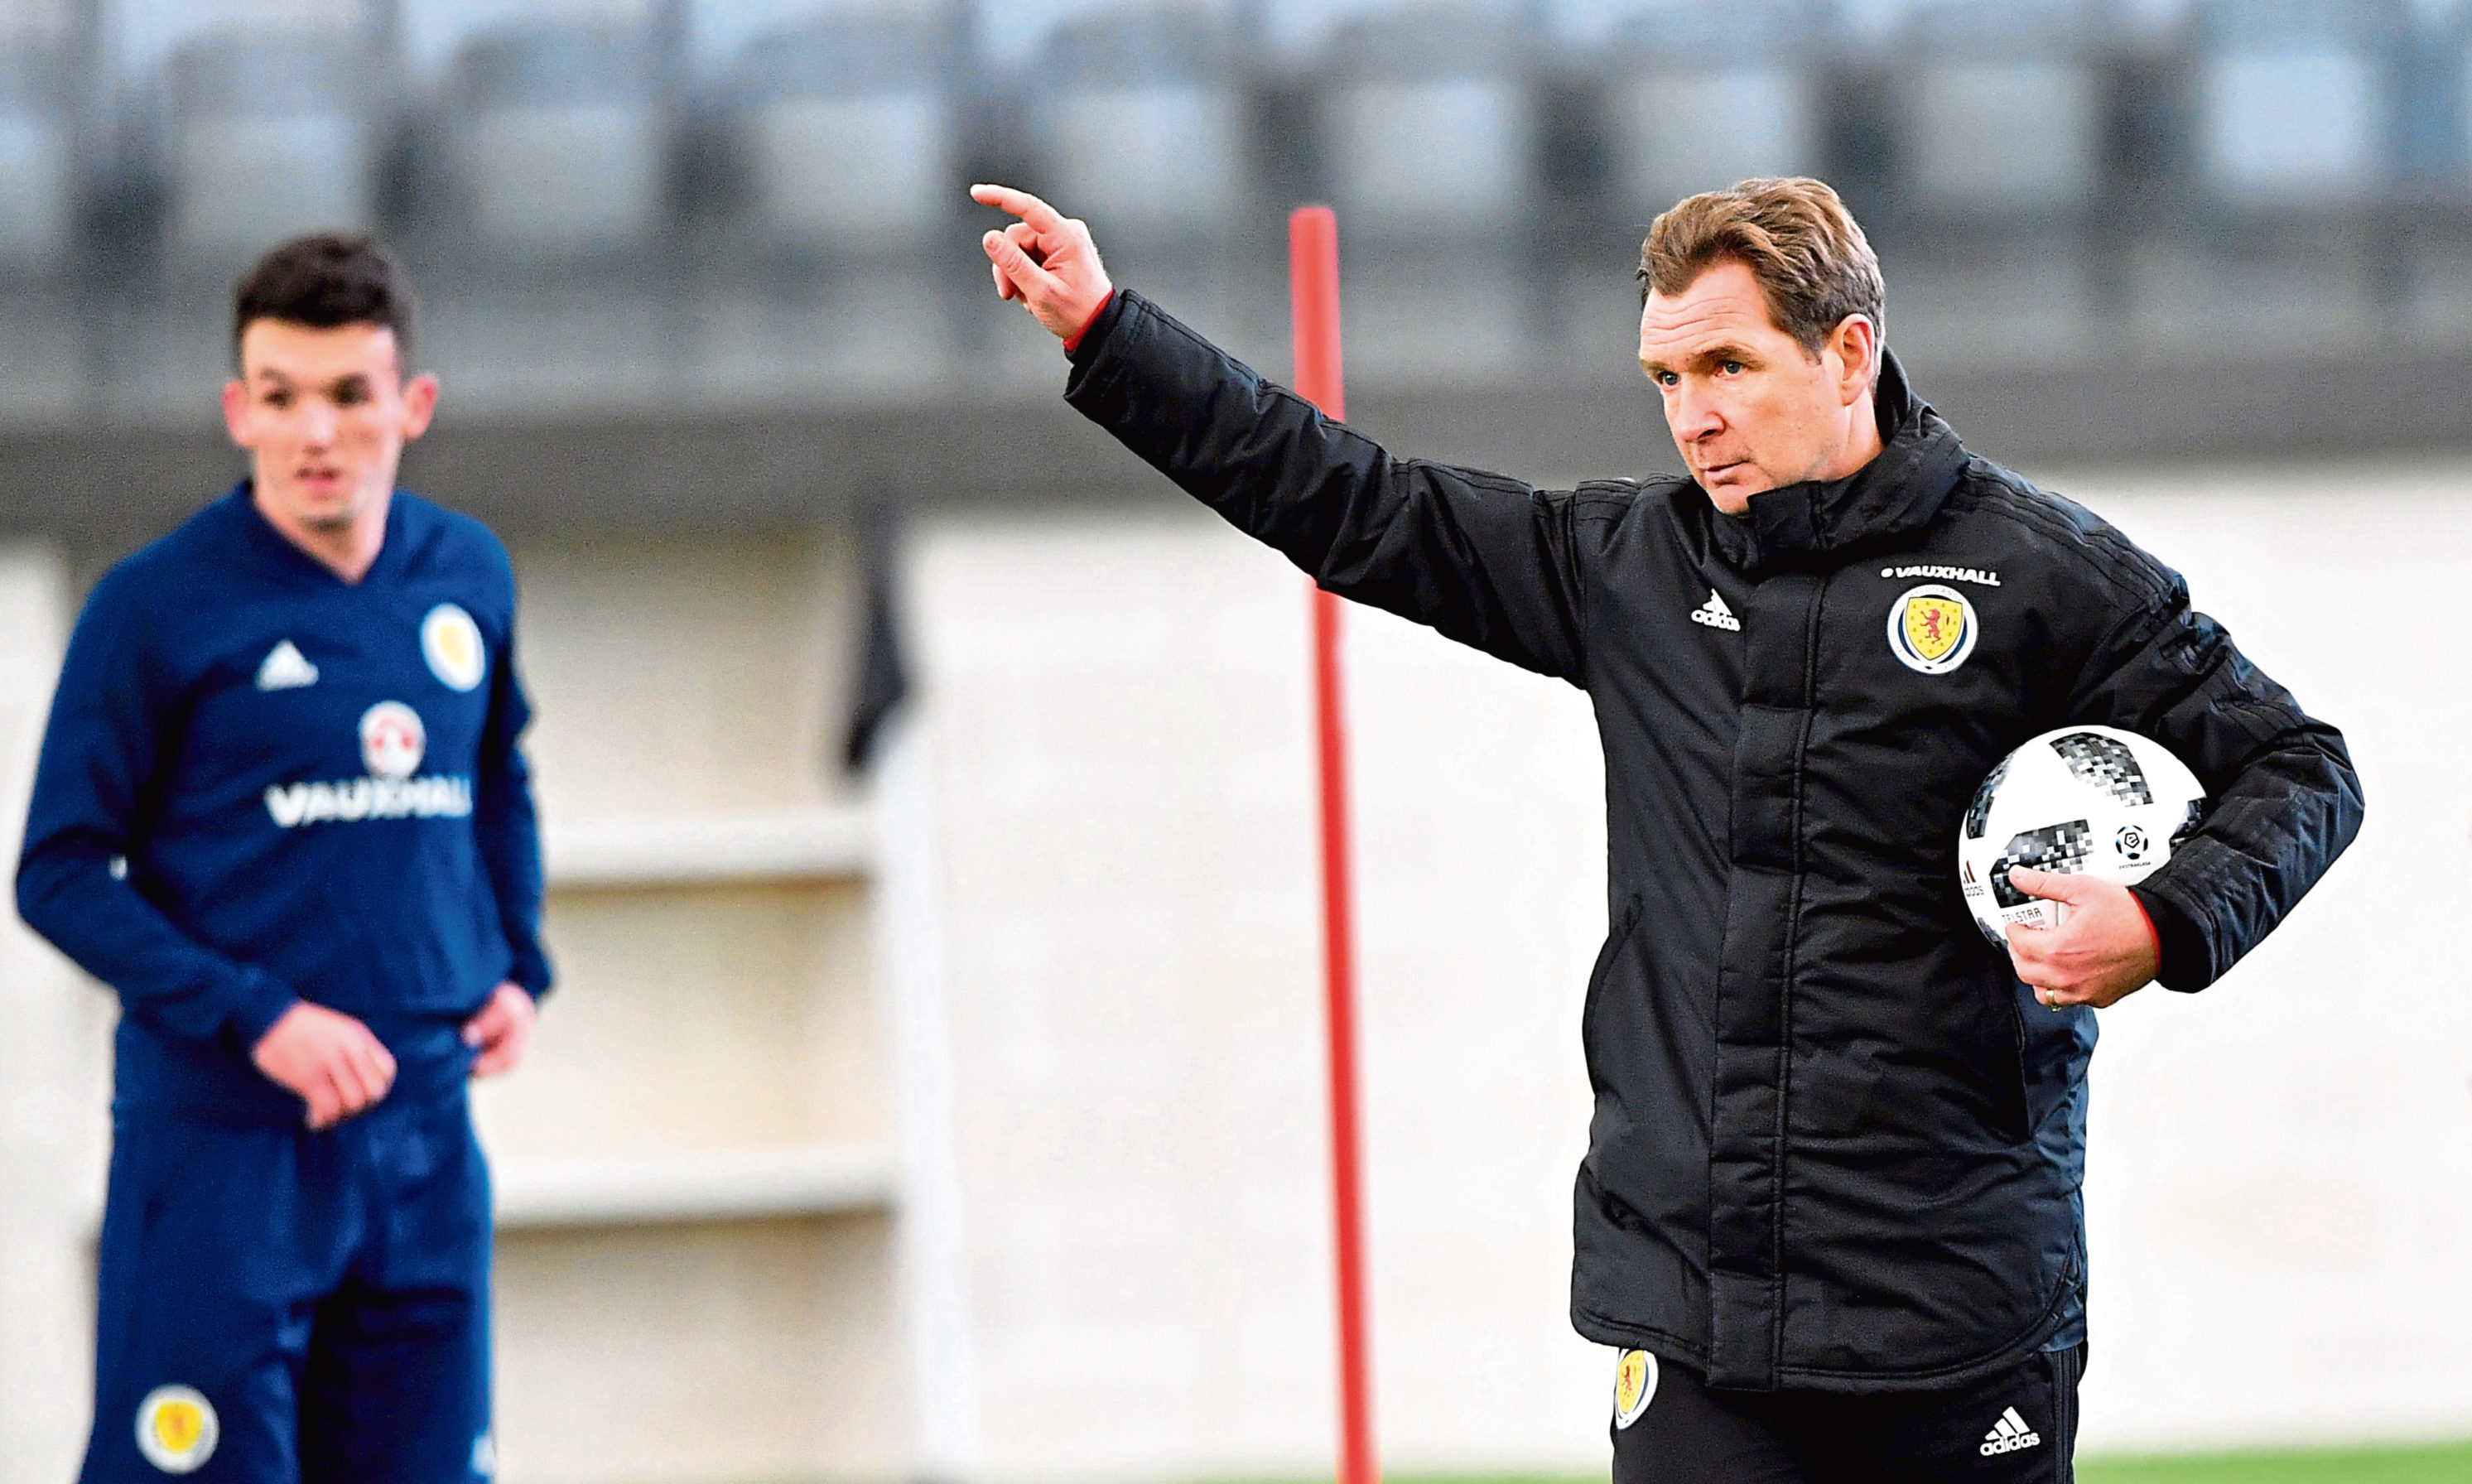 Scotland assistant Peter Grant